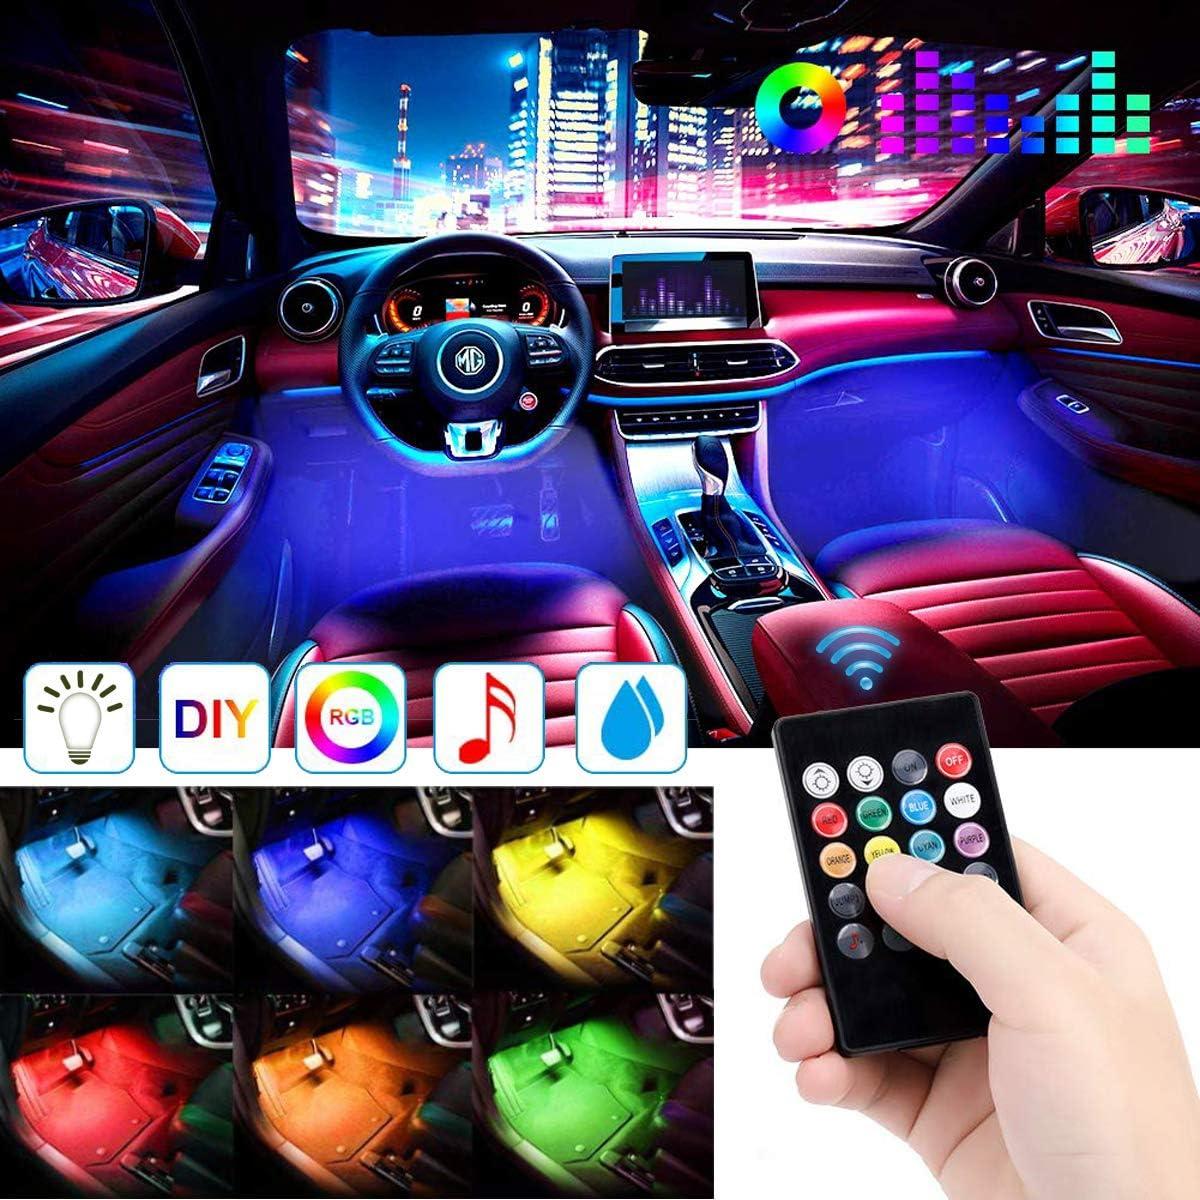 EJ's SUPER CAR 4pcs 48 LED DC 12V Multicolor Music Car Interior Lights